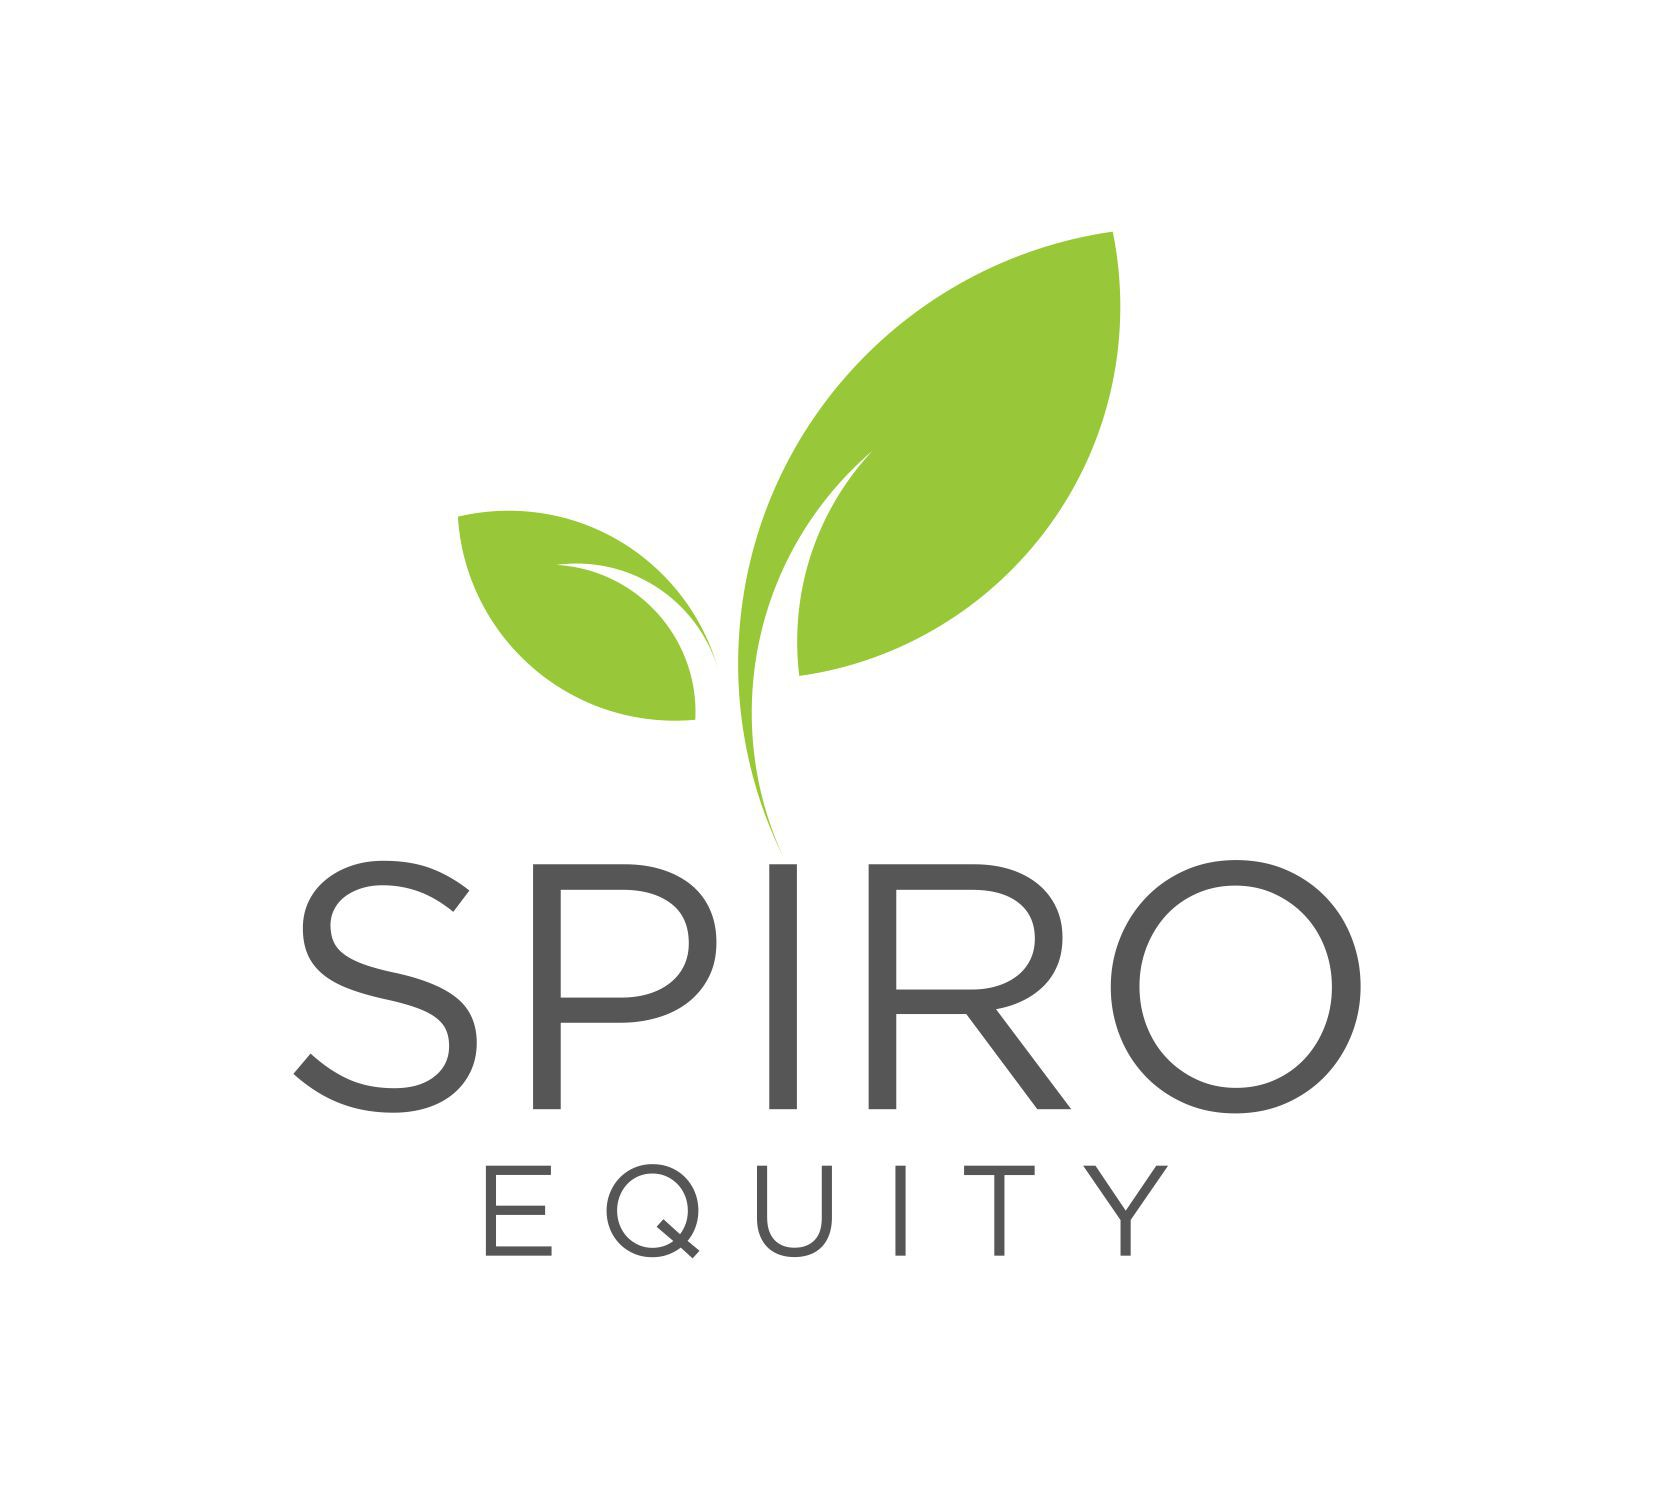 Spiro - Make a Great Spiro Equity Logo